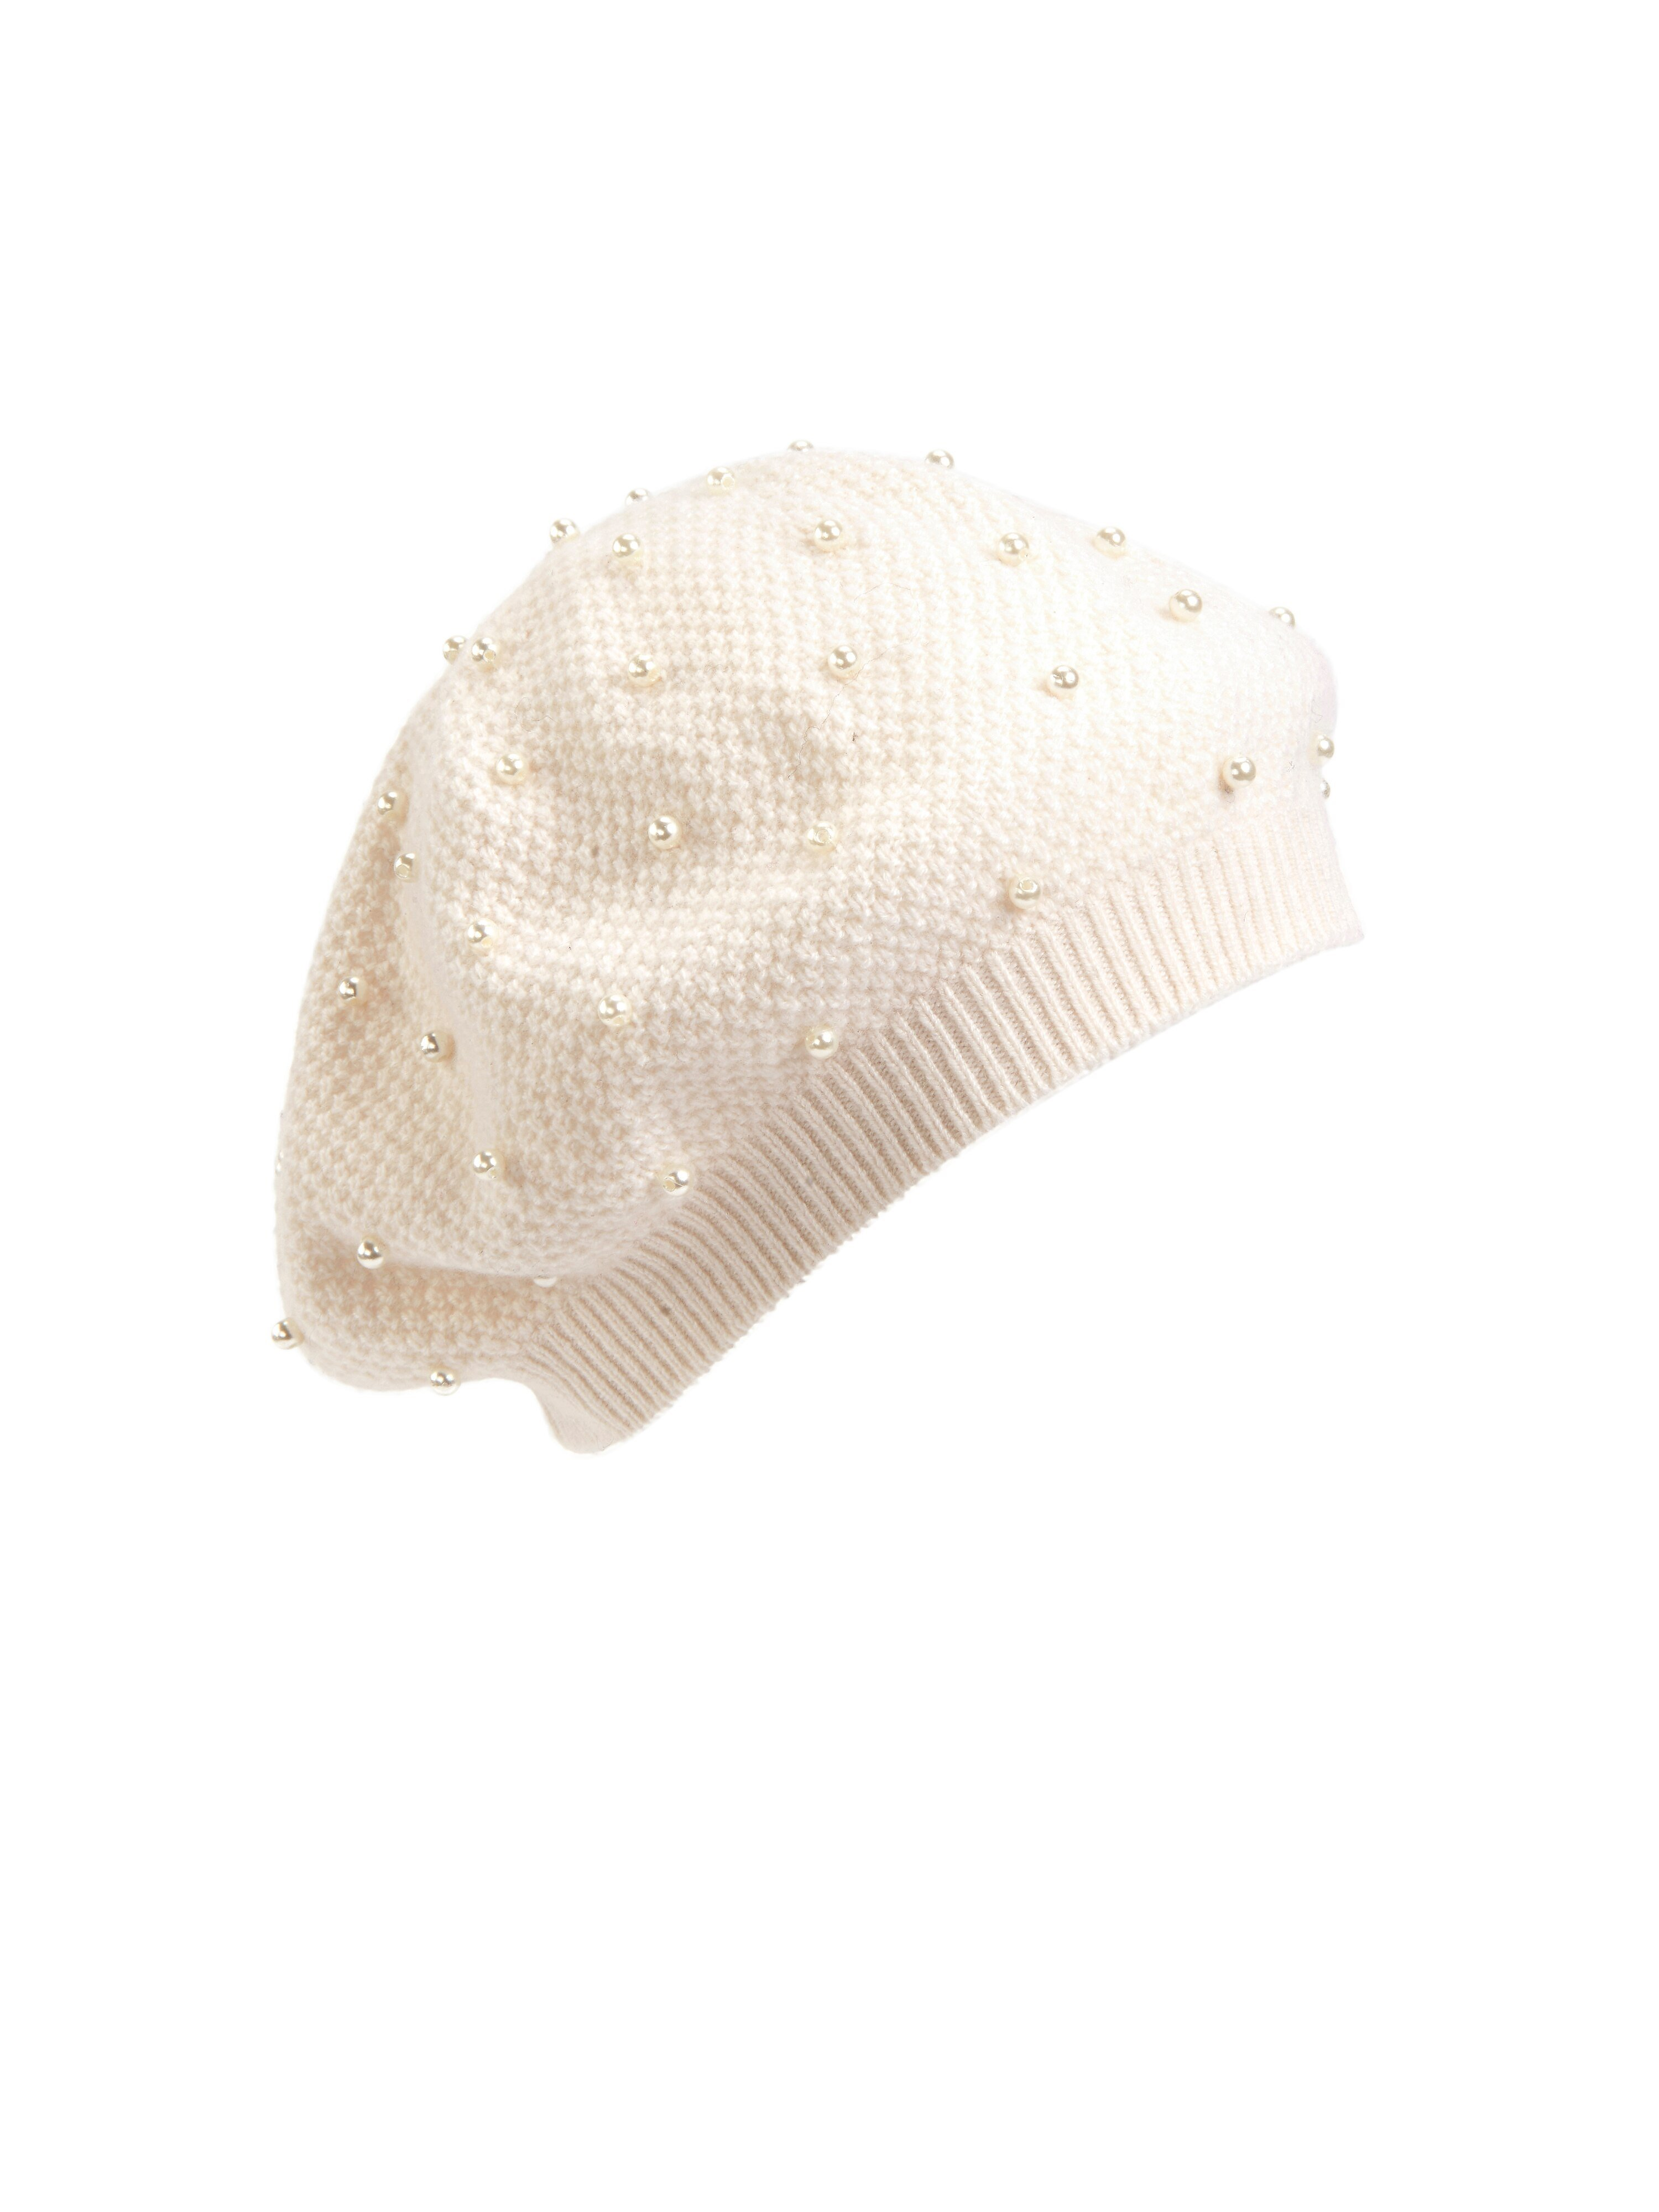 peter hahn cashmere - Baskenmütze in 100% Kaschmir  beige